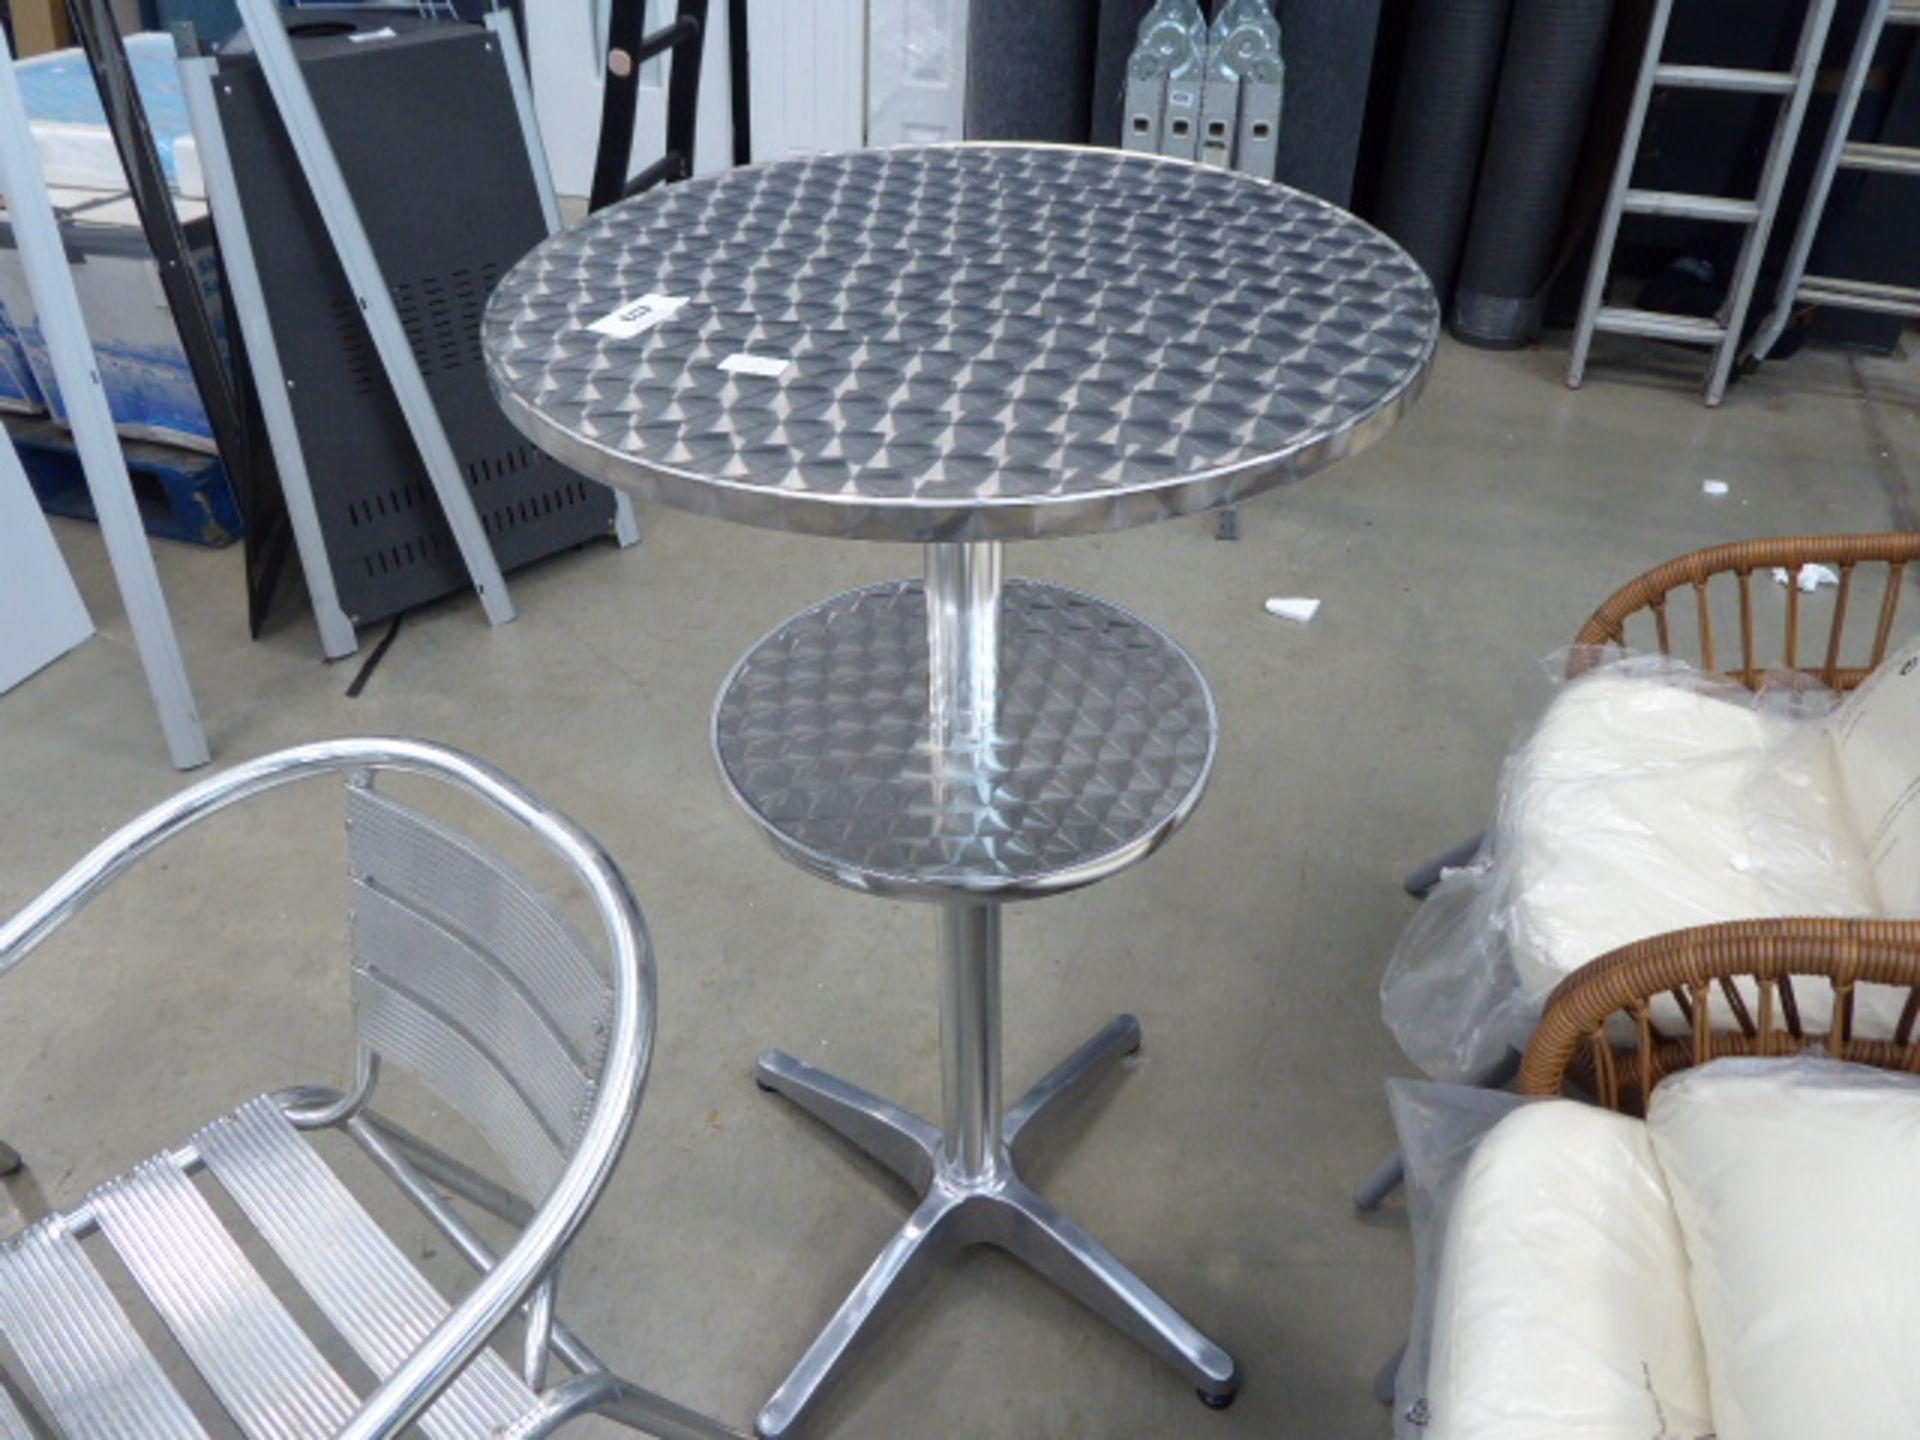 Lot 4173 - Tall silver bar table